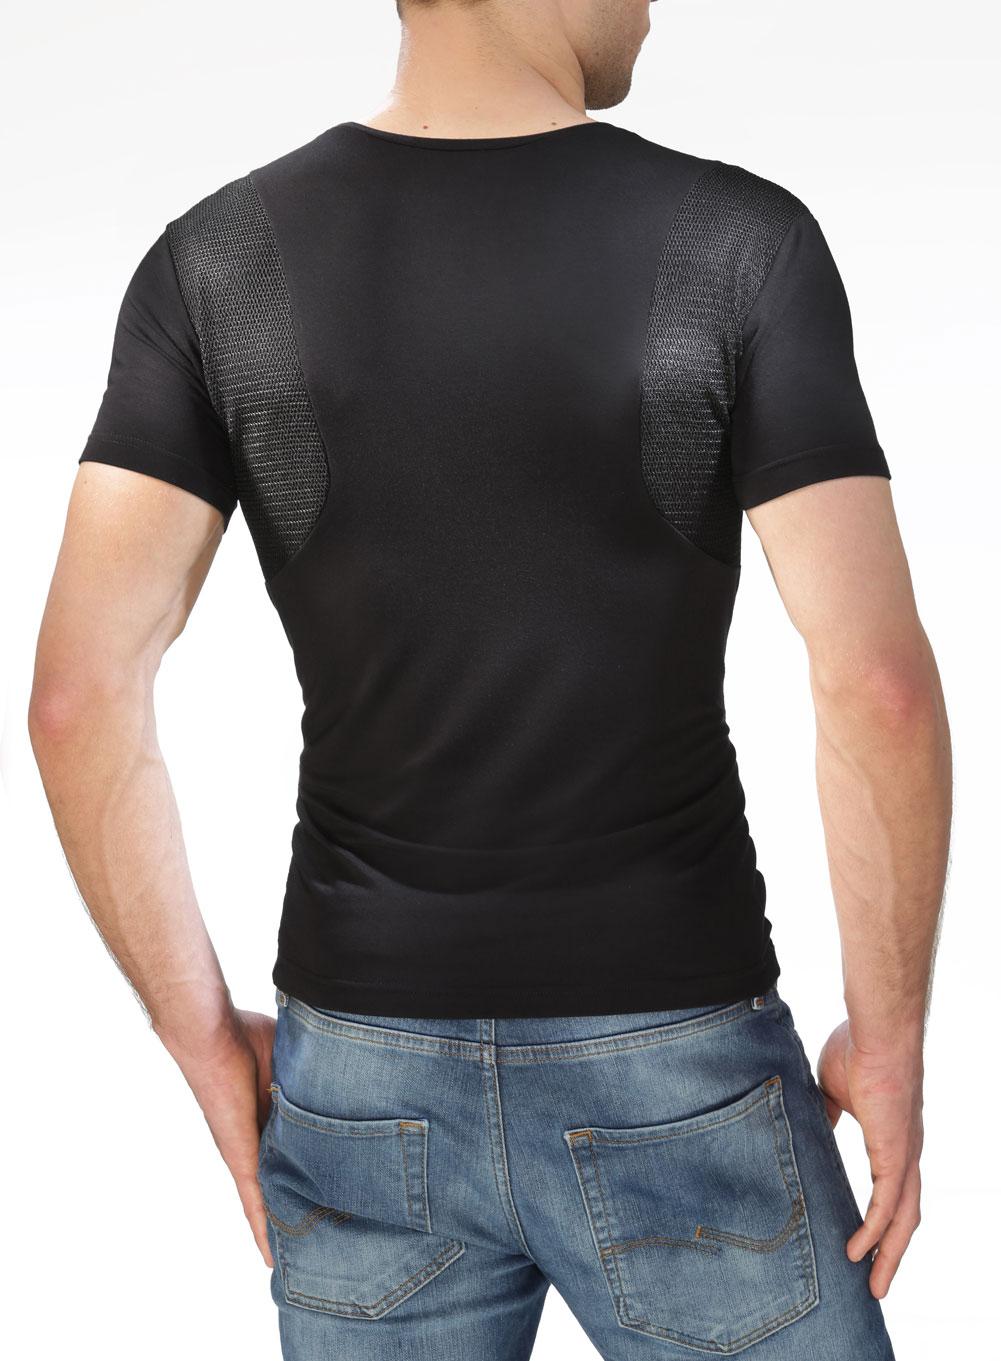 Men-Shirt-Shoulder-RT.jpg